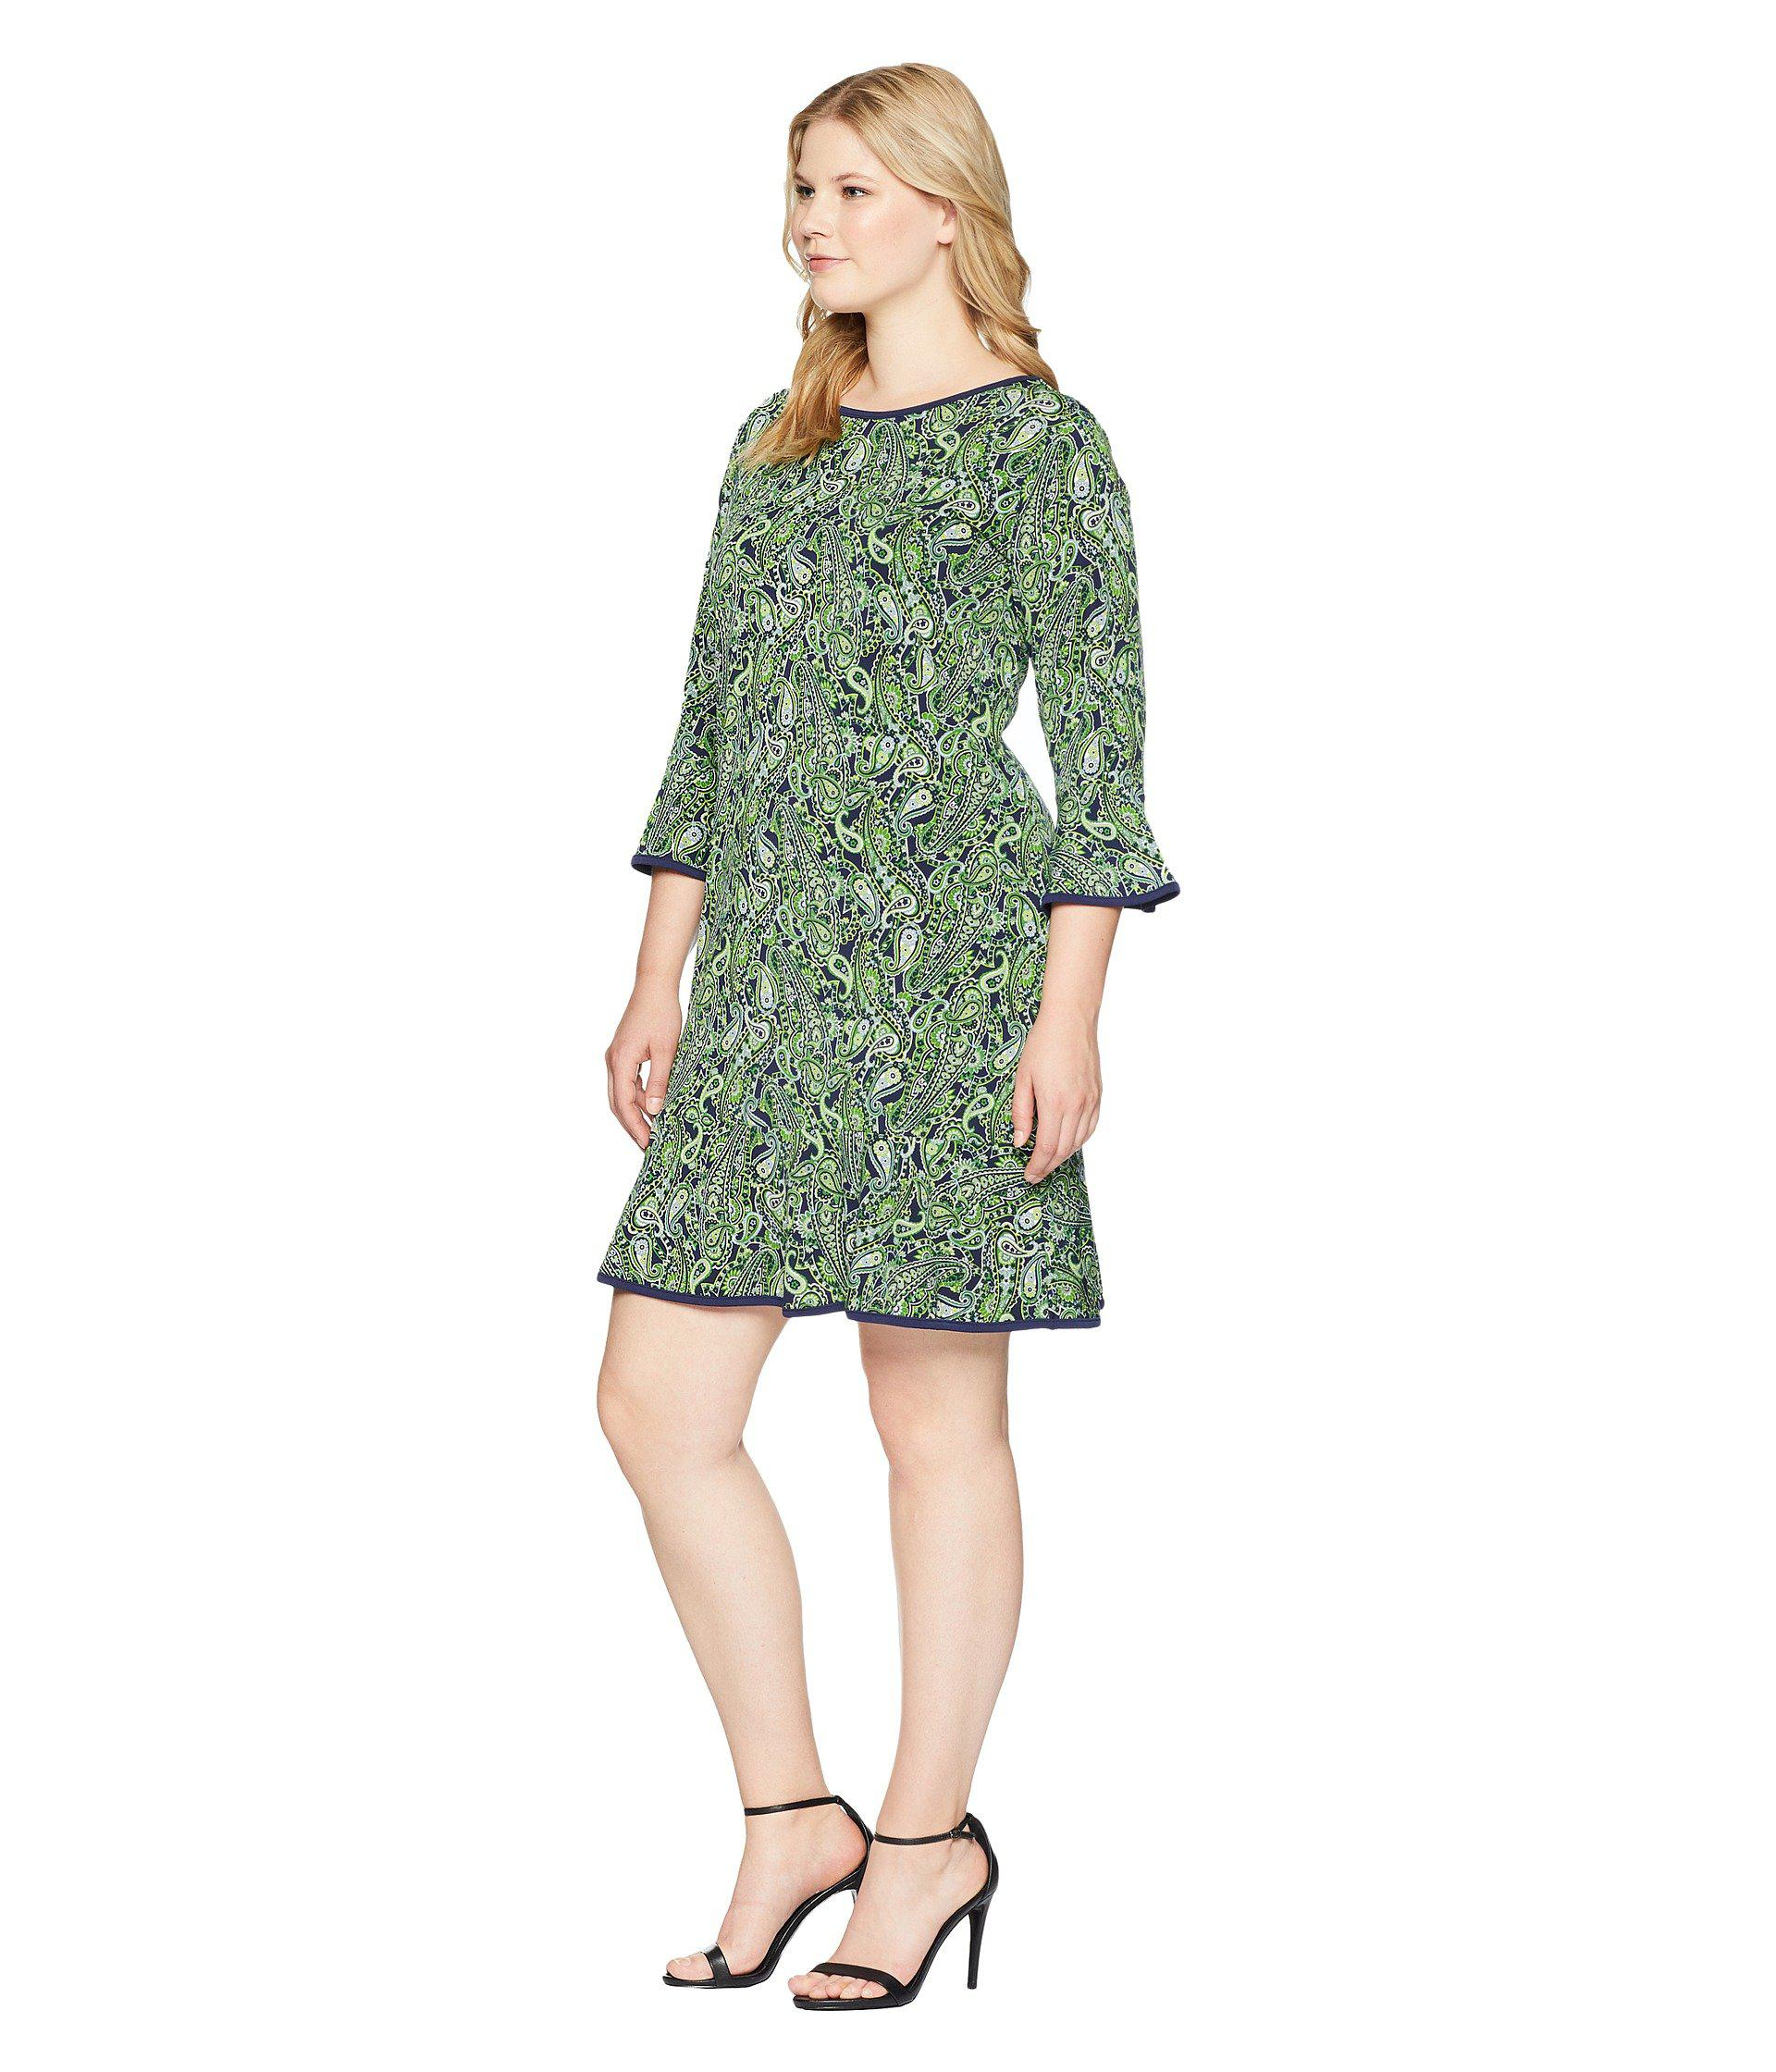 375825dd35e85 Lyst - MICHAEL Michael Kors Plus Size Paisley Flounce Dress in Green - Save  55%